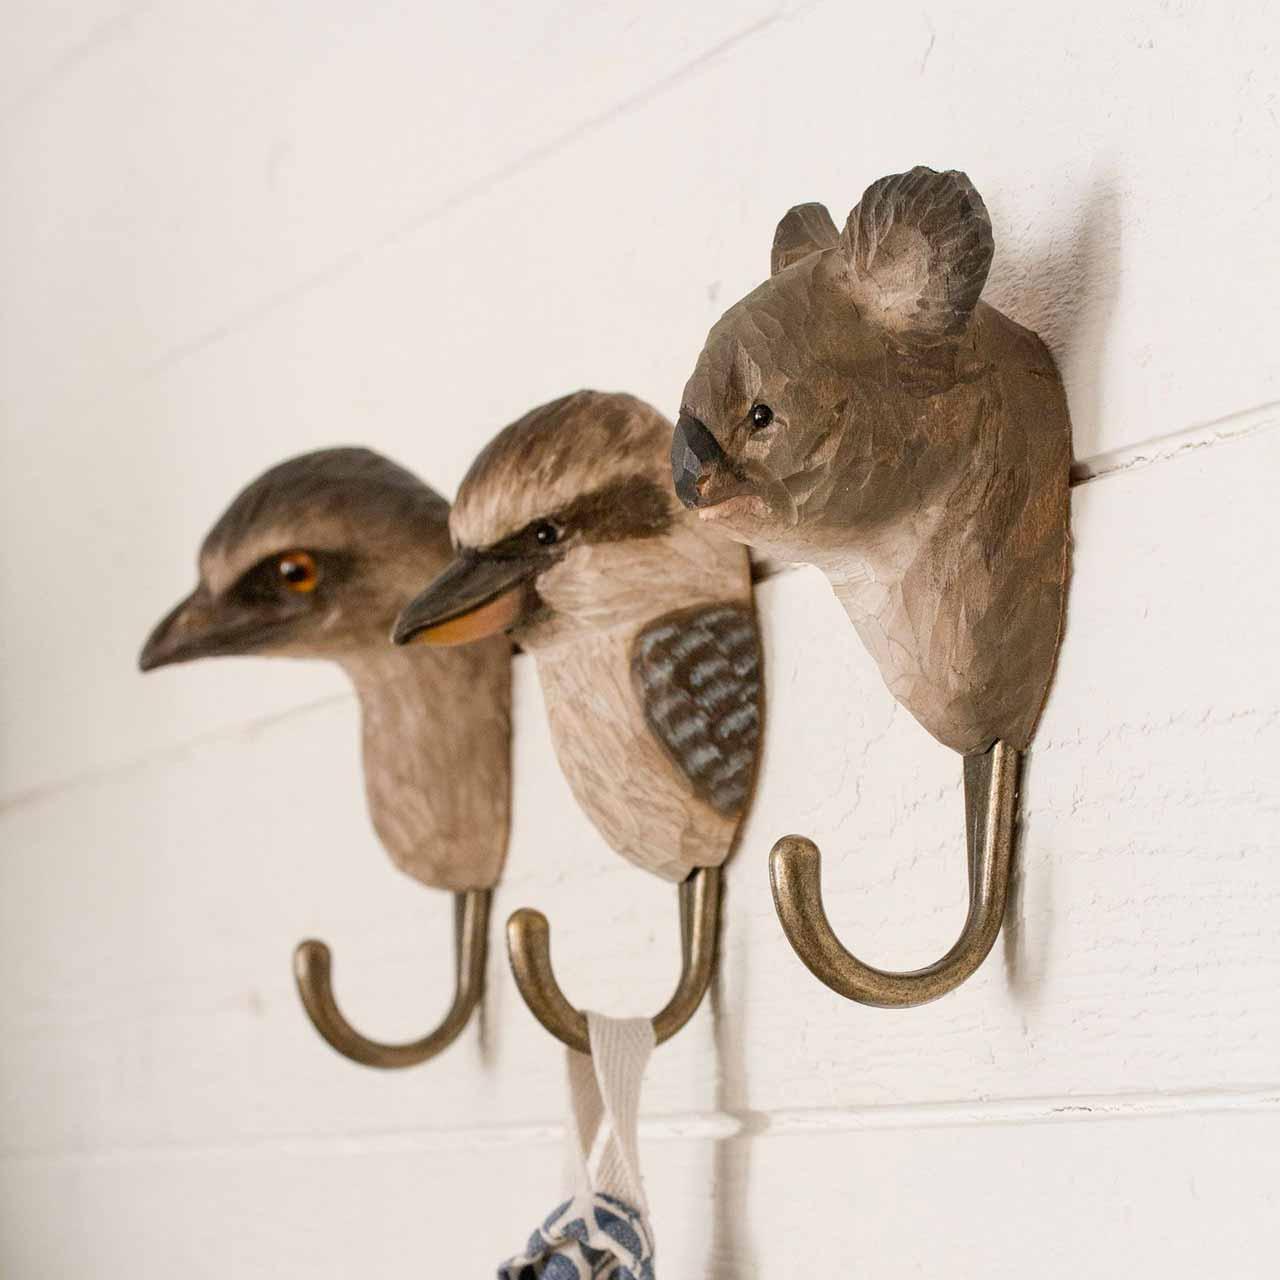 WILDWILD LIFE GARDEN Wall Hooks (only koala hook incl. in offer)   the design gift shop